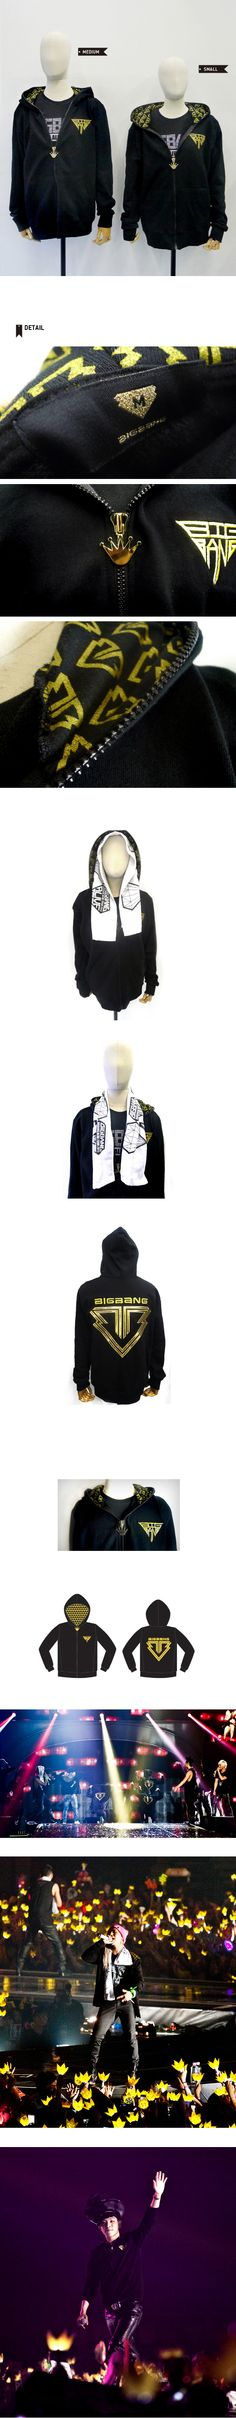 ...(Or) i'll buy this one...hummm kinda confused i love Big Bang and 2NE1 (>,<)